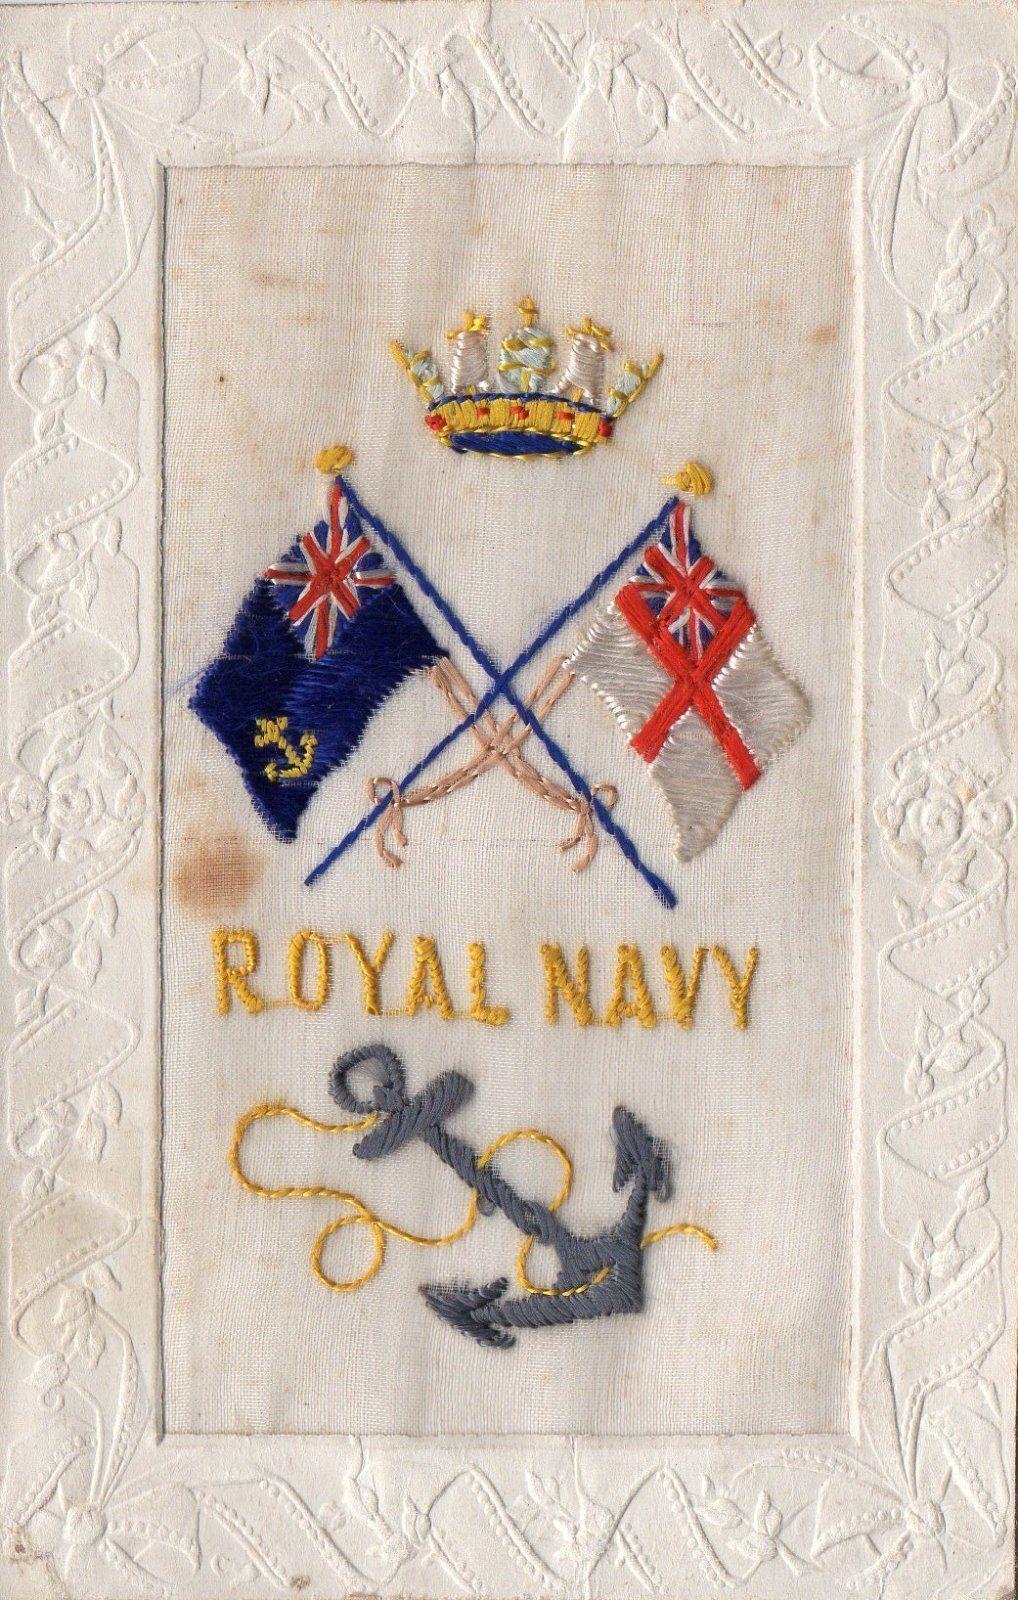 Royal Navy: Ww1 Embroidered Military Silk Postcard • EUR 5,84 ...